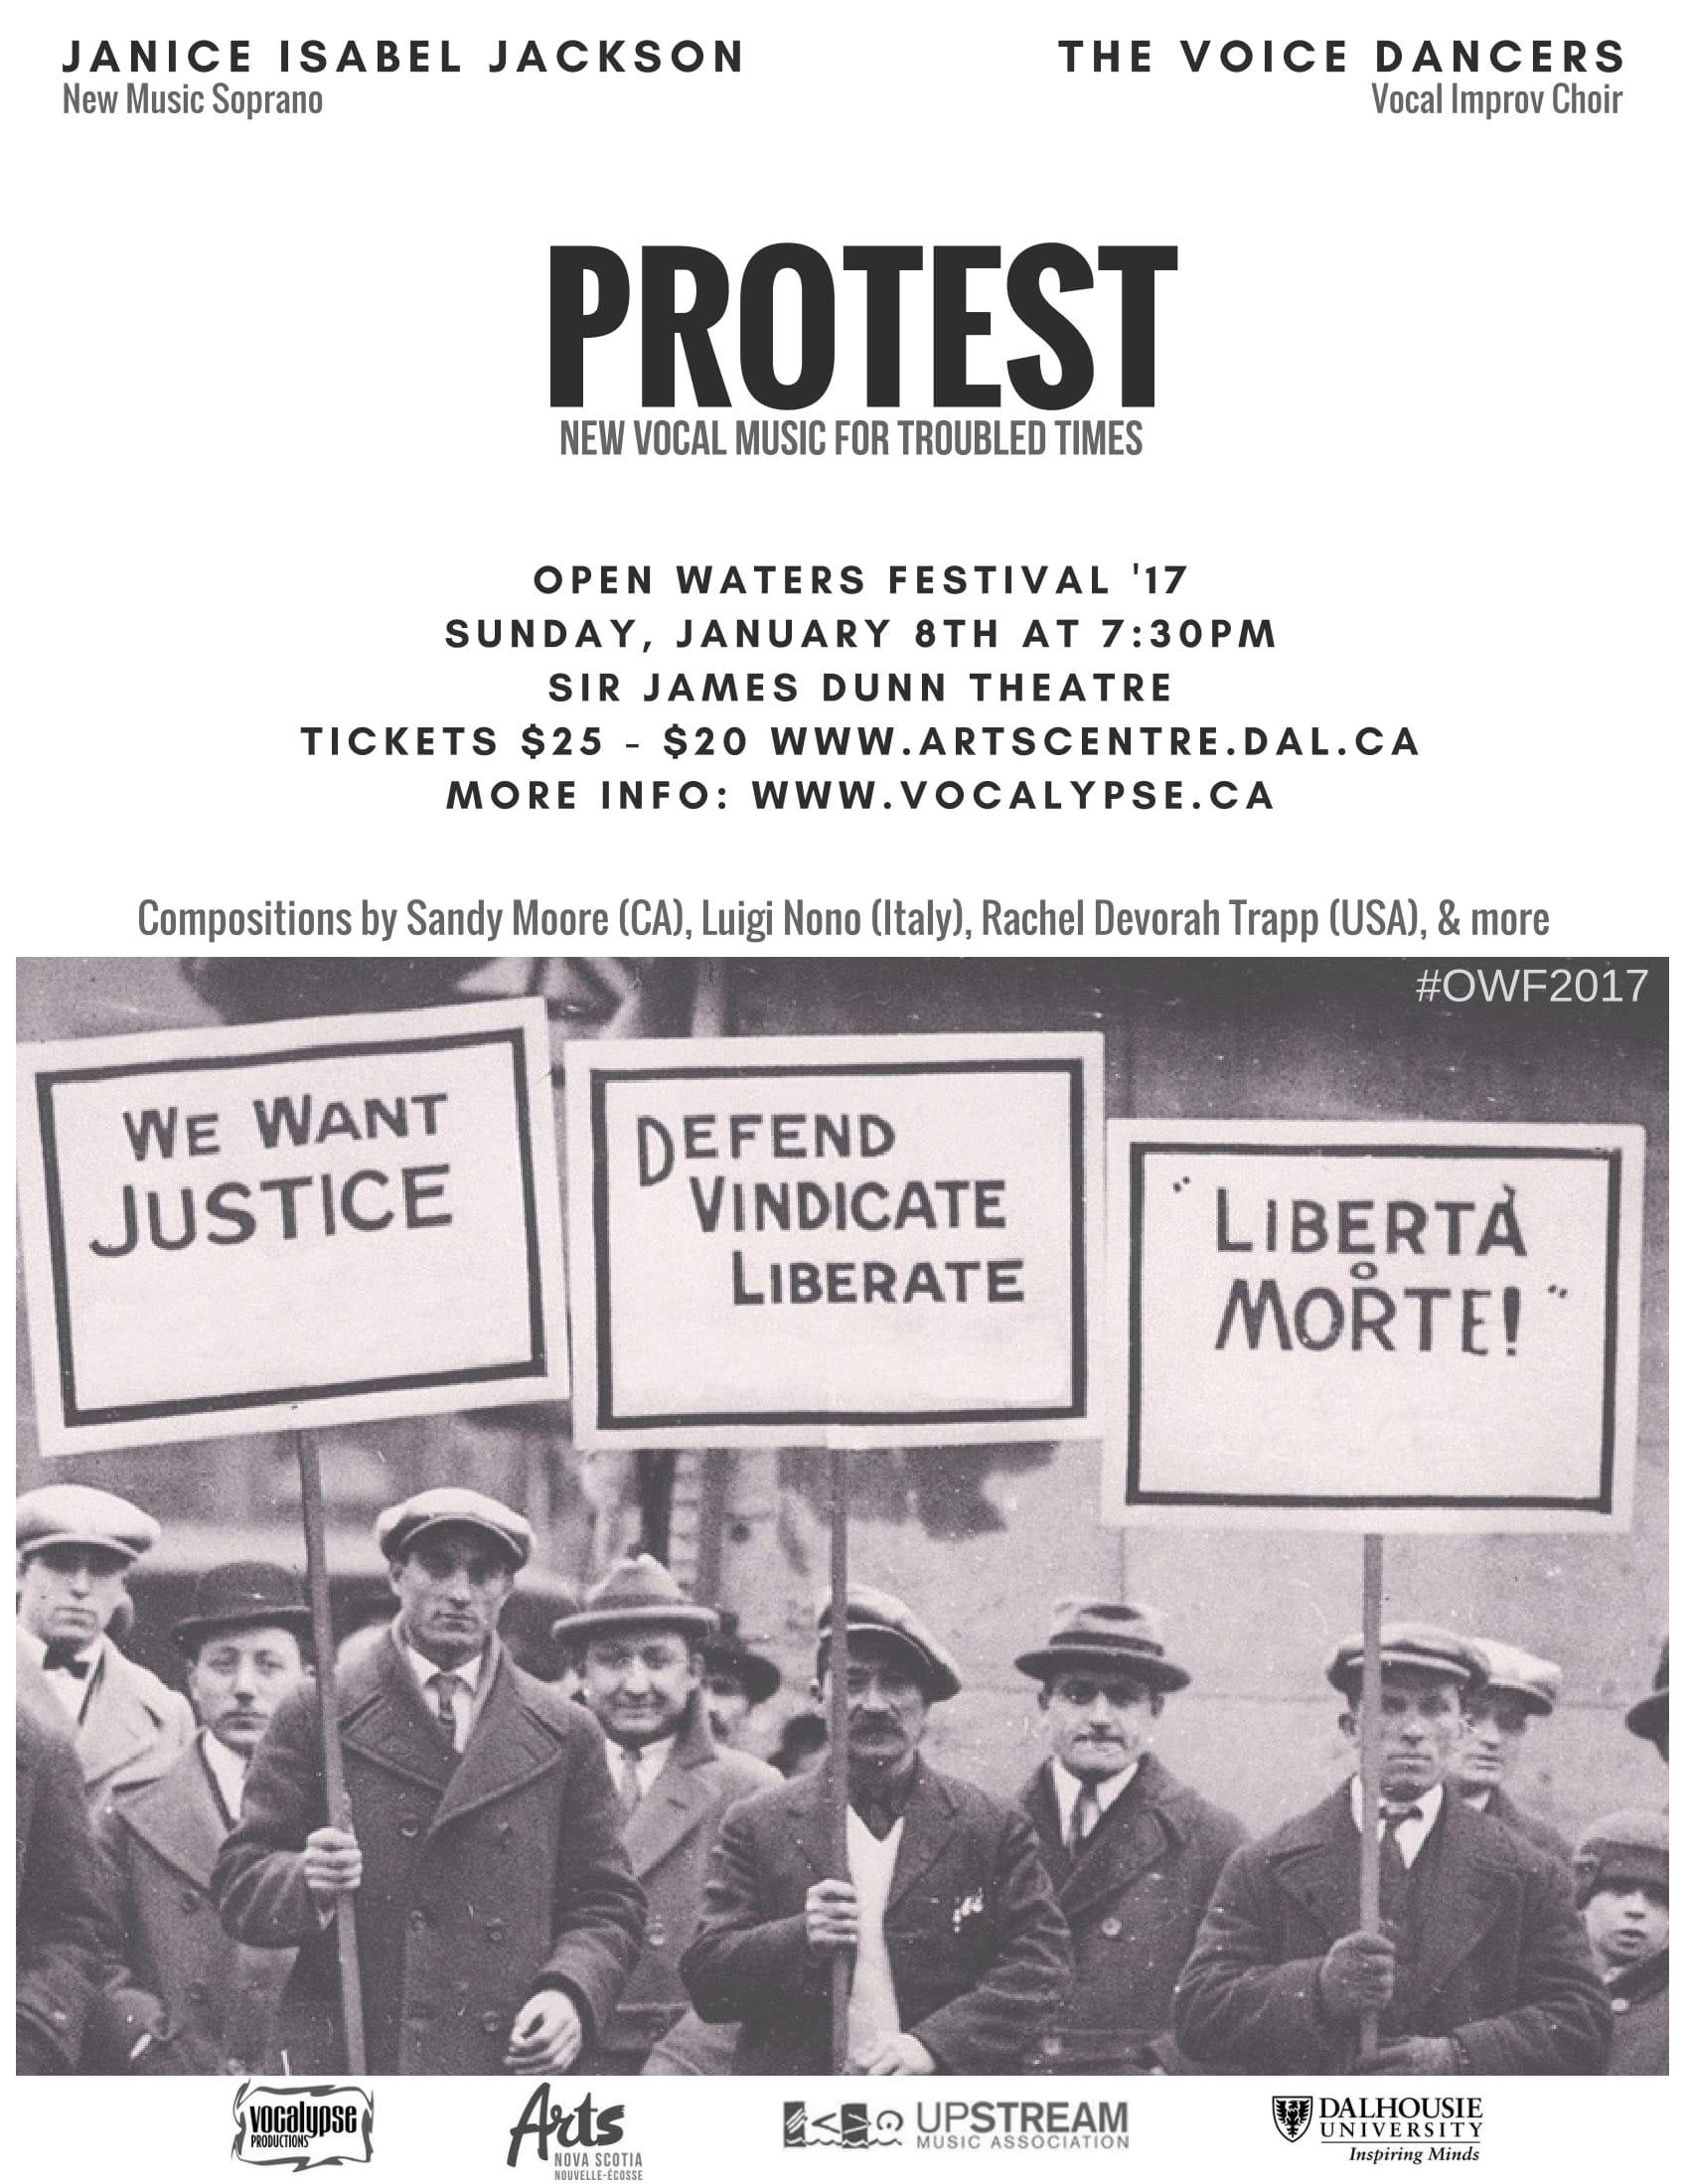 Vocalypse PROTEST